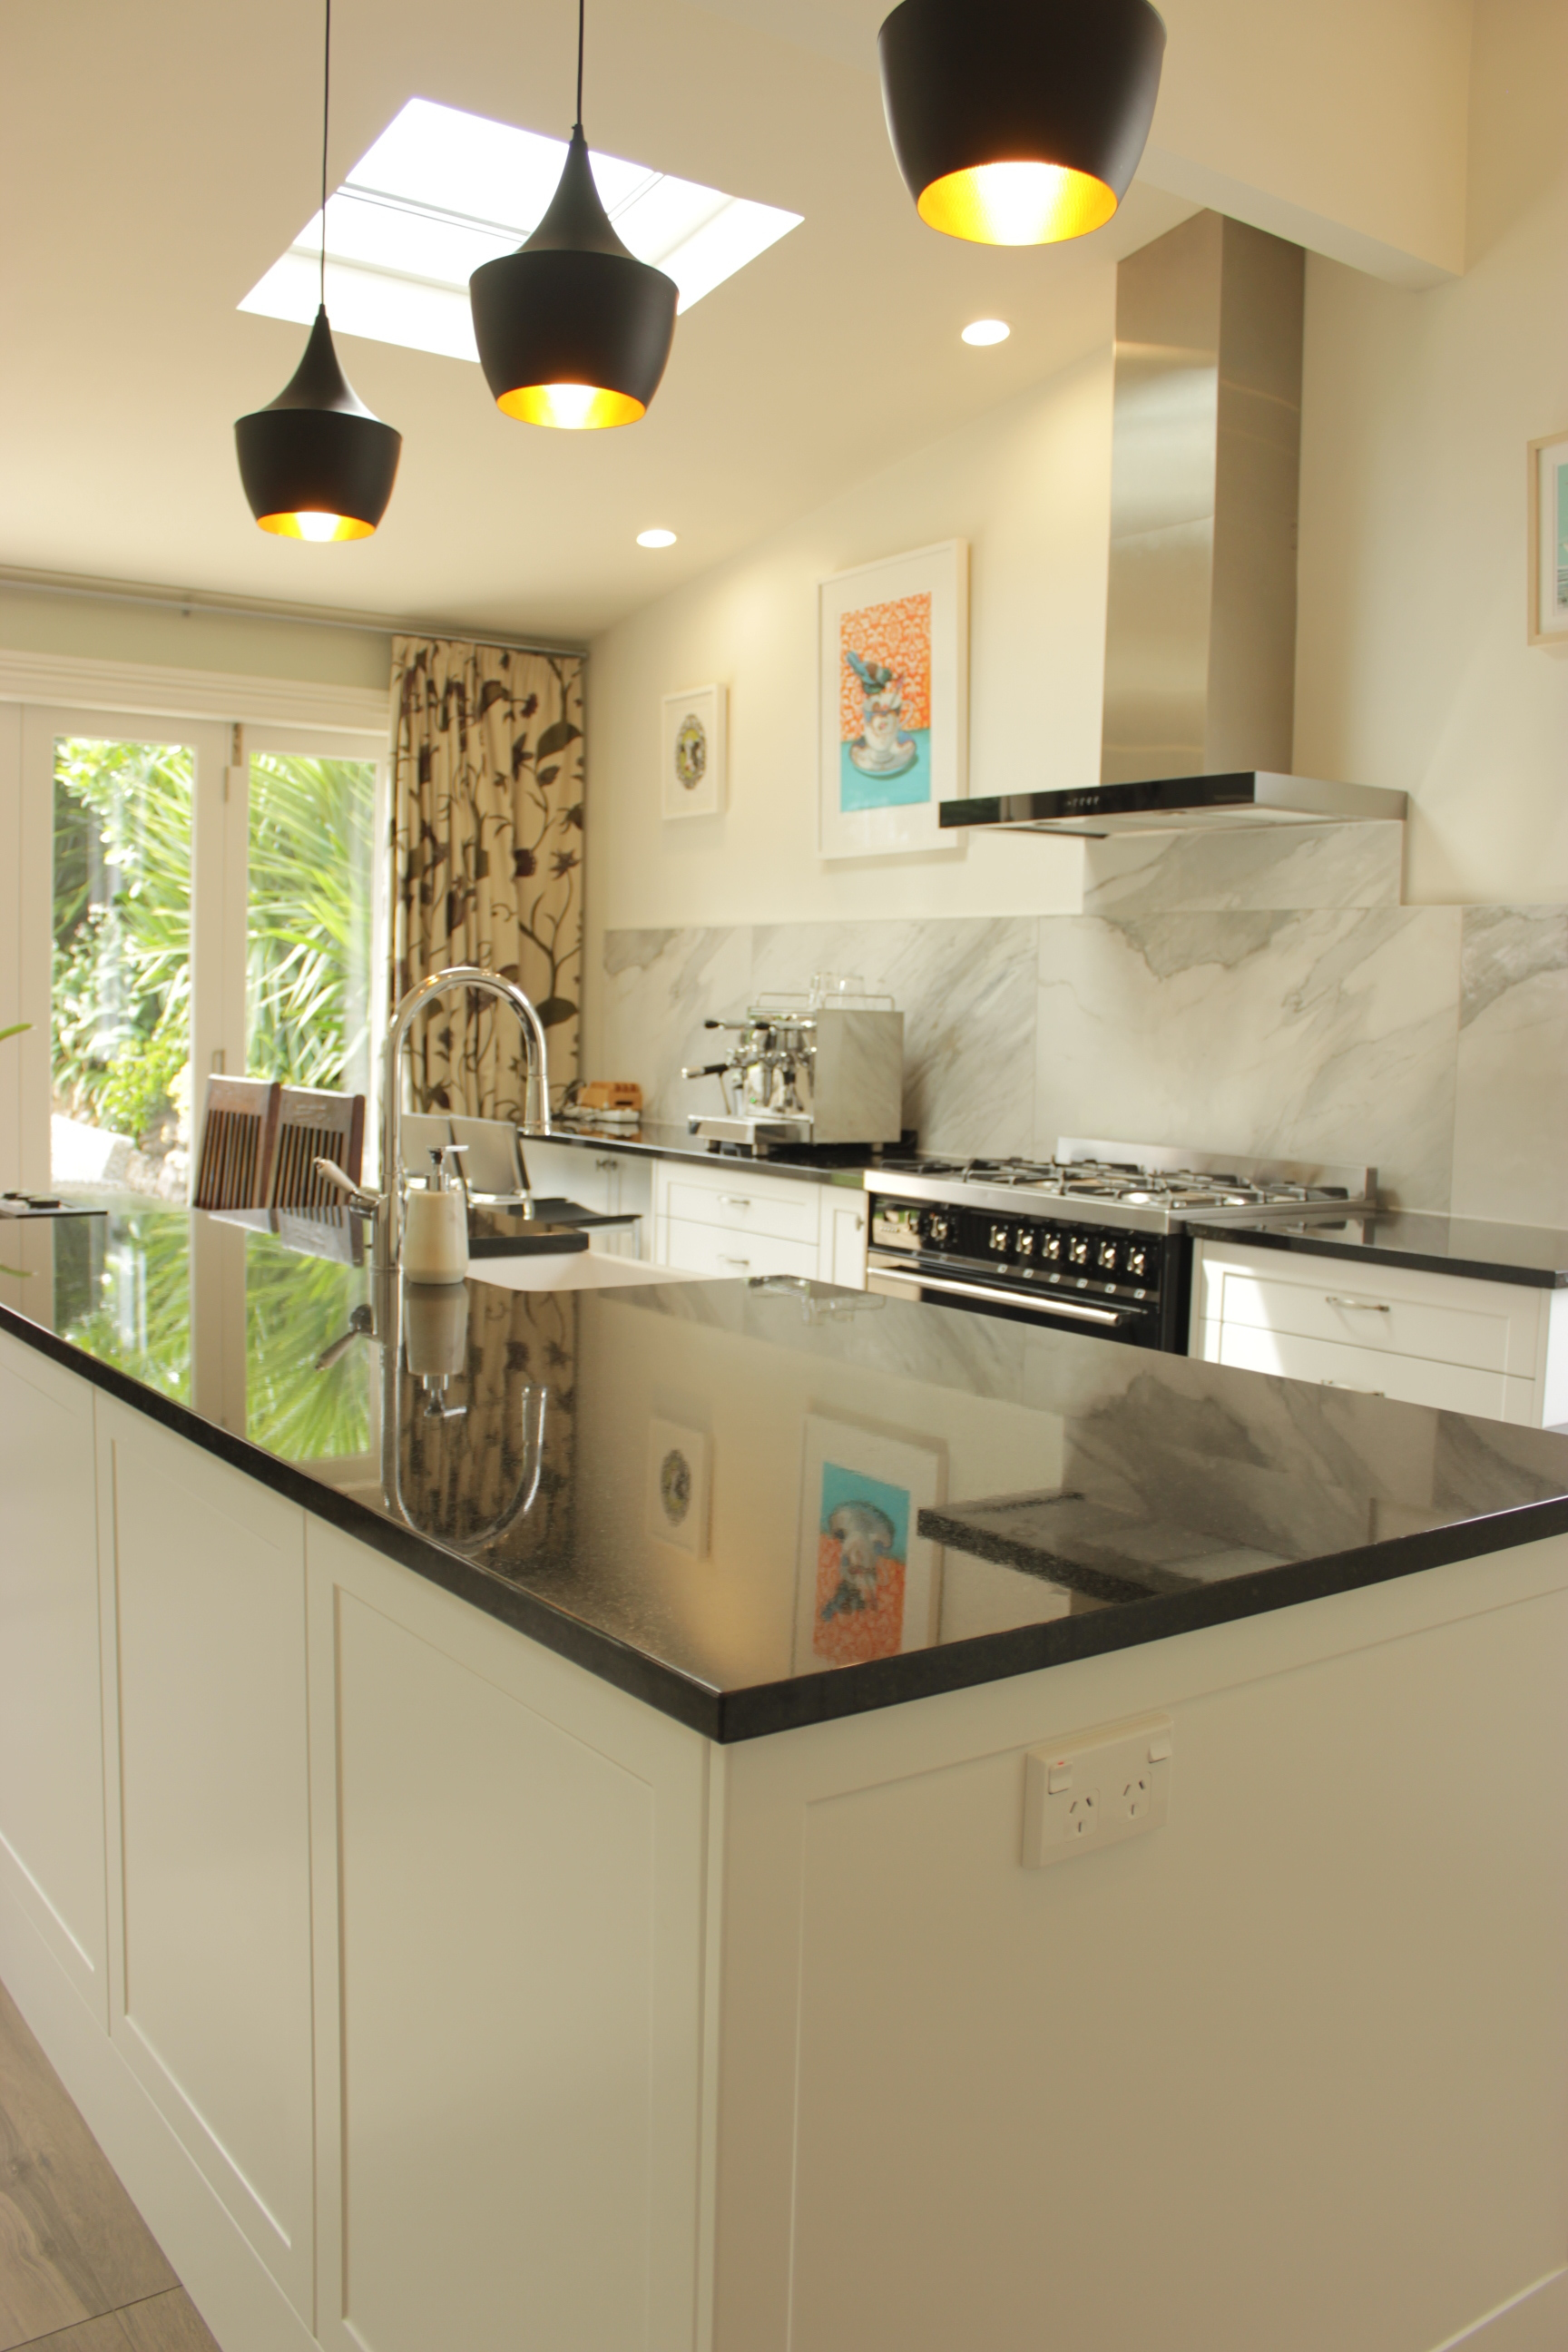 KITCHEN RENOVATION  Features:Custom Cabinetry, Engineered Stone Workbench, Sunken Sink, Fitted Splashback